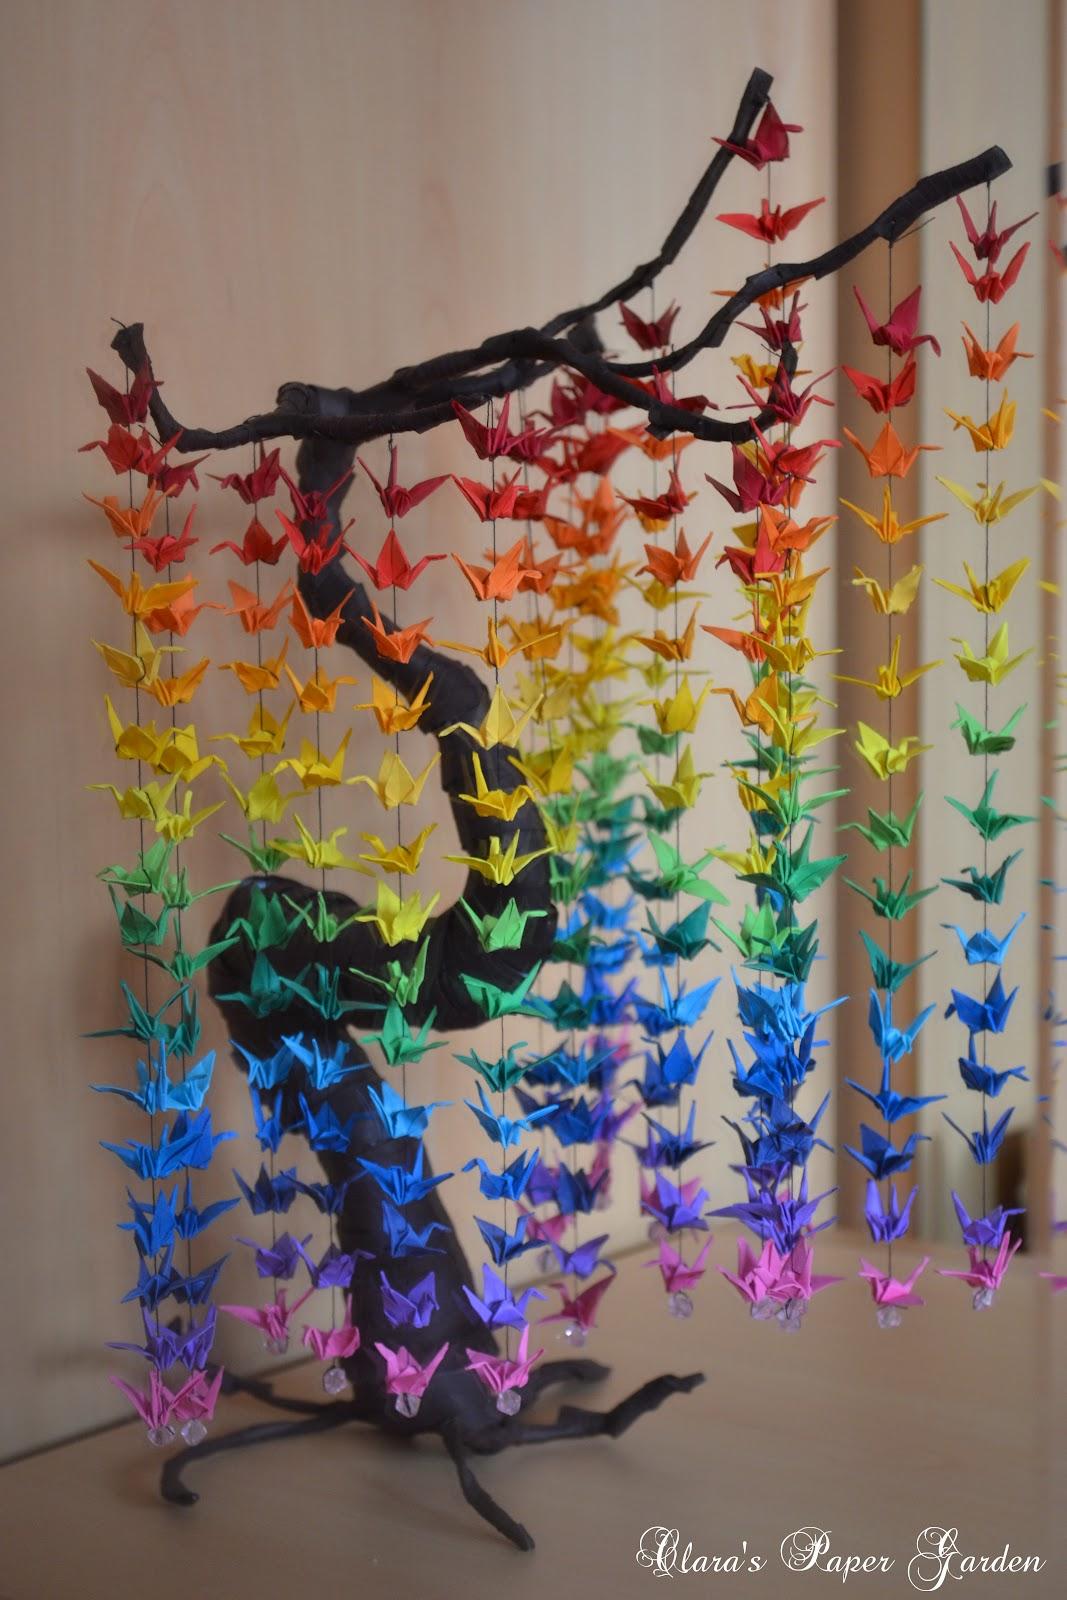 Sz npomp s mobild sz origami madarakkal sz nes tletek for How to decorate a paper butterfly